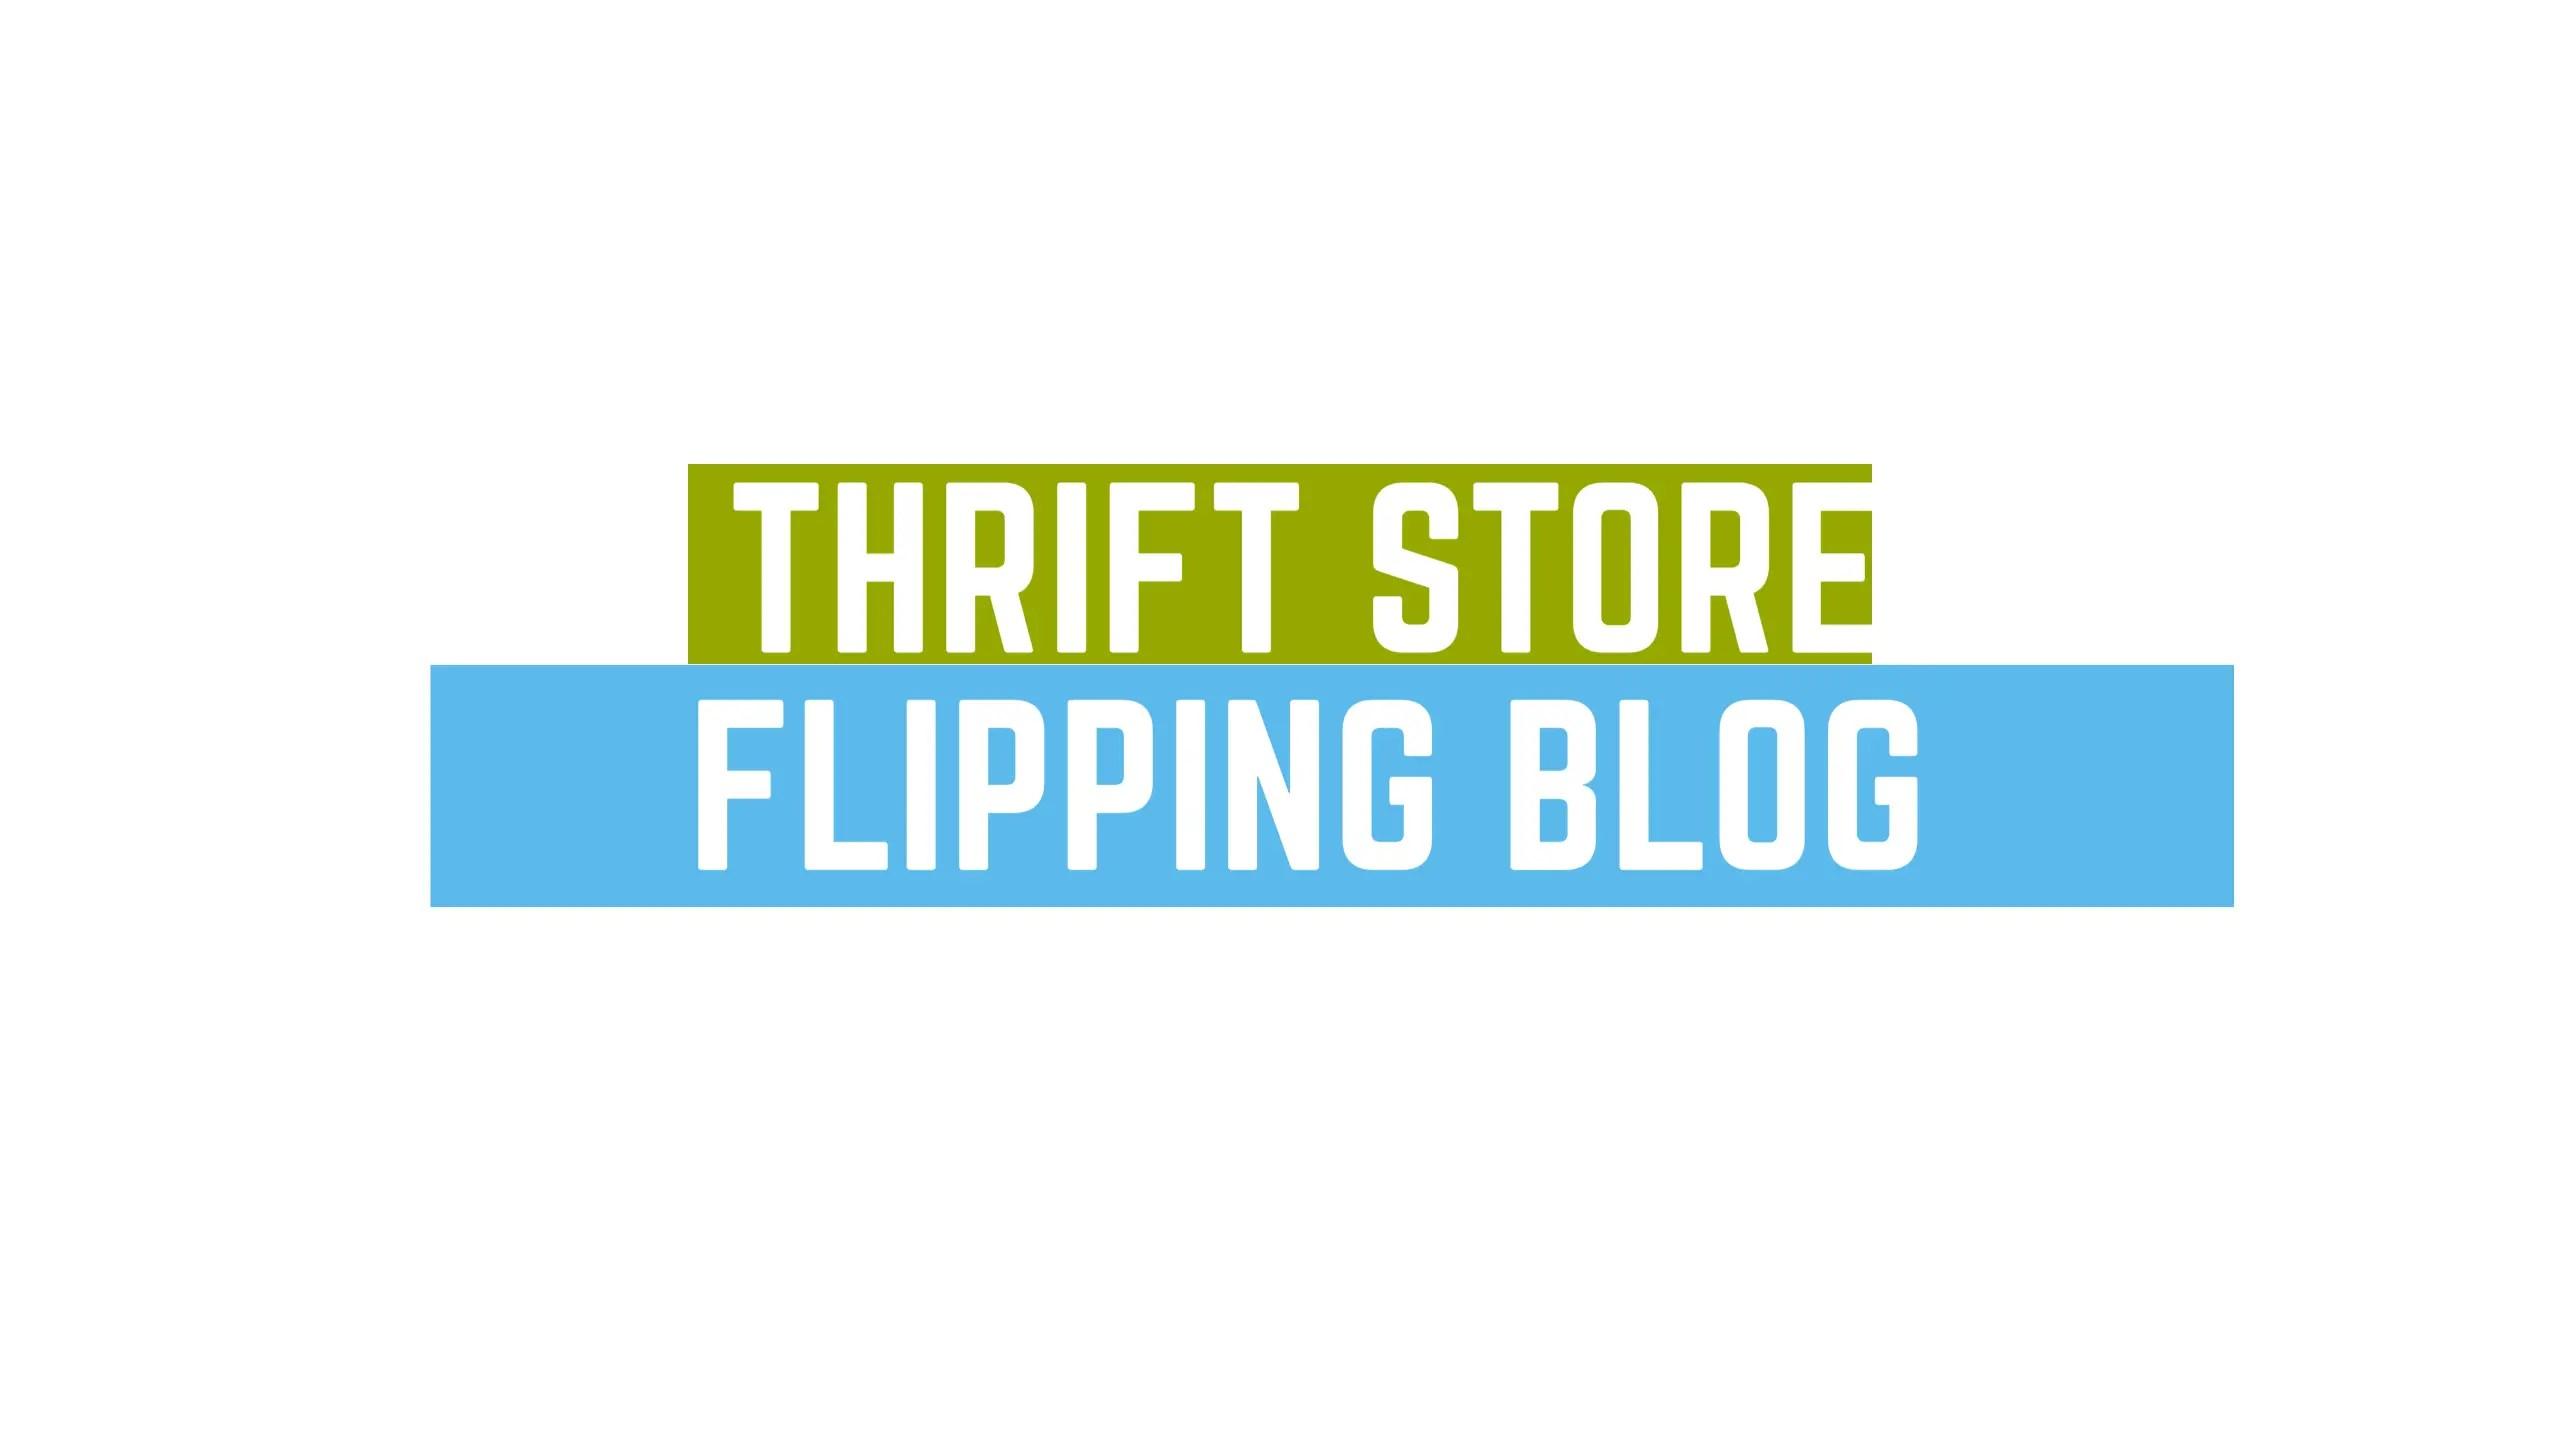 Thrift store flipping blog